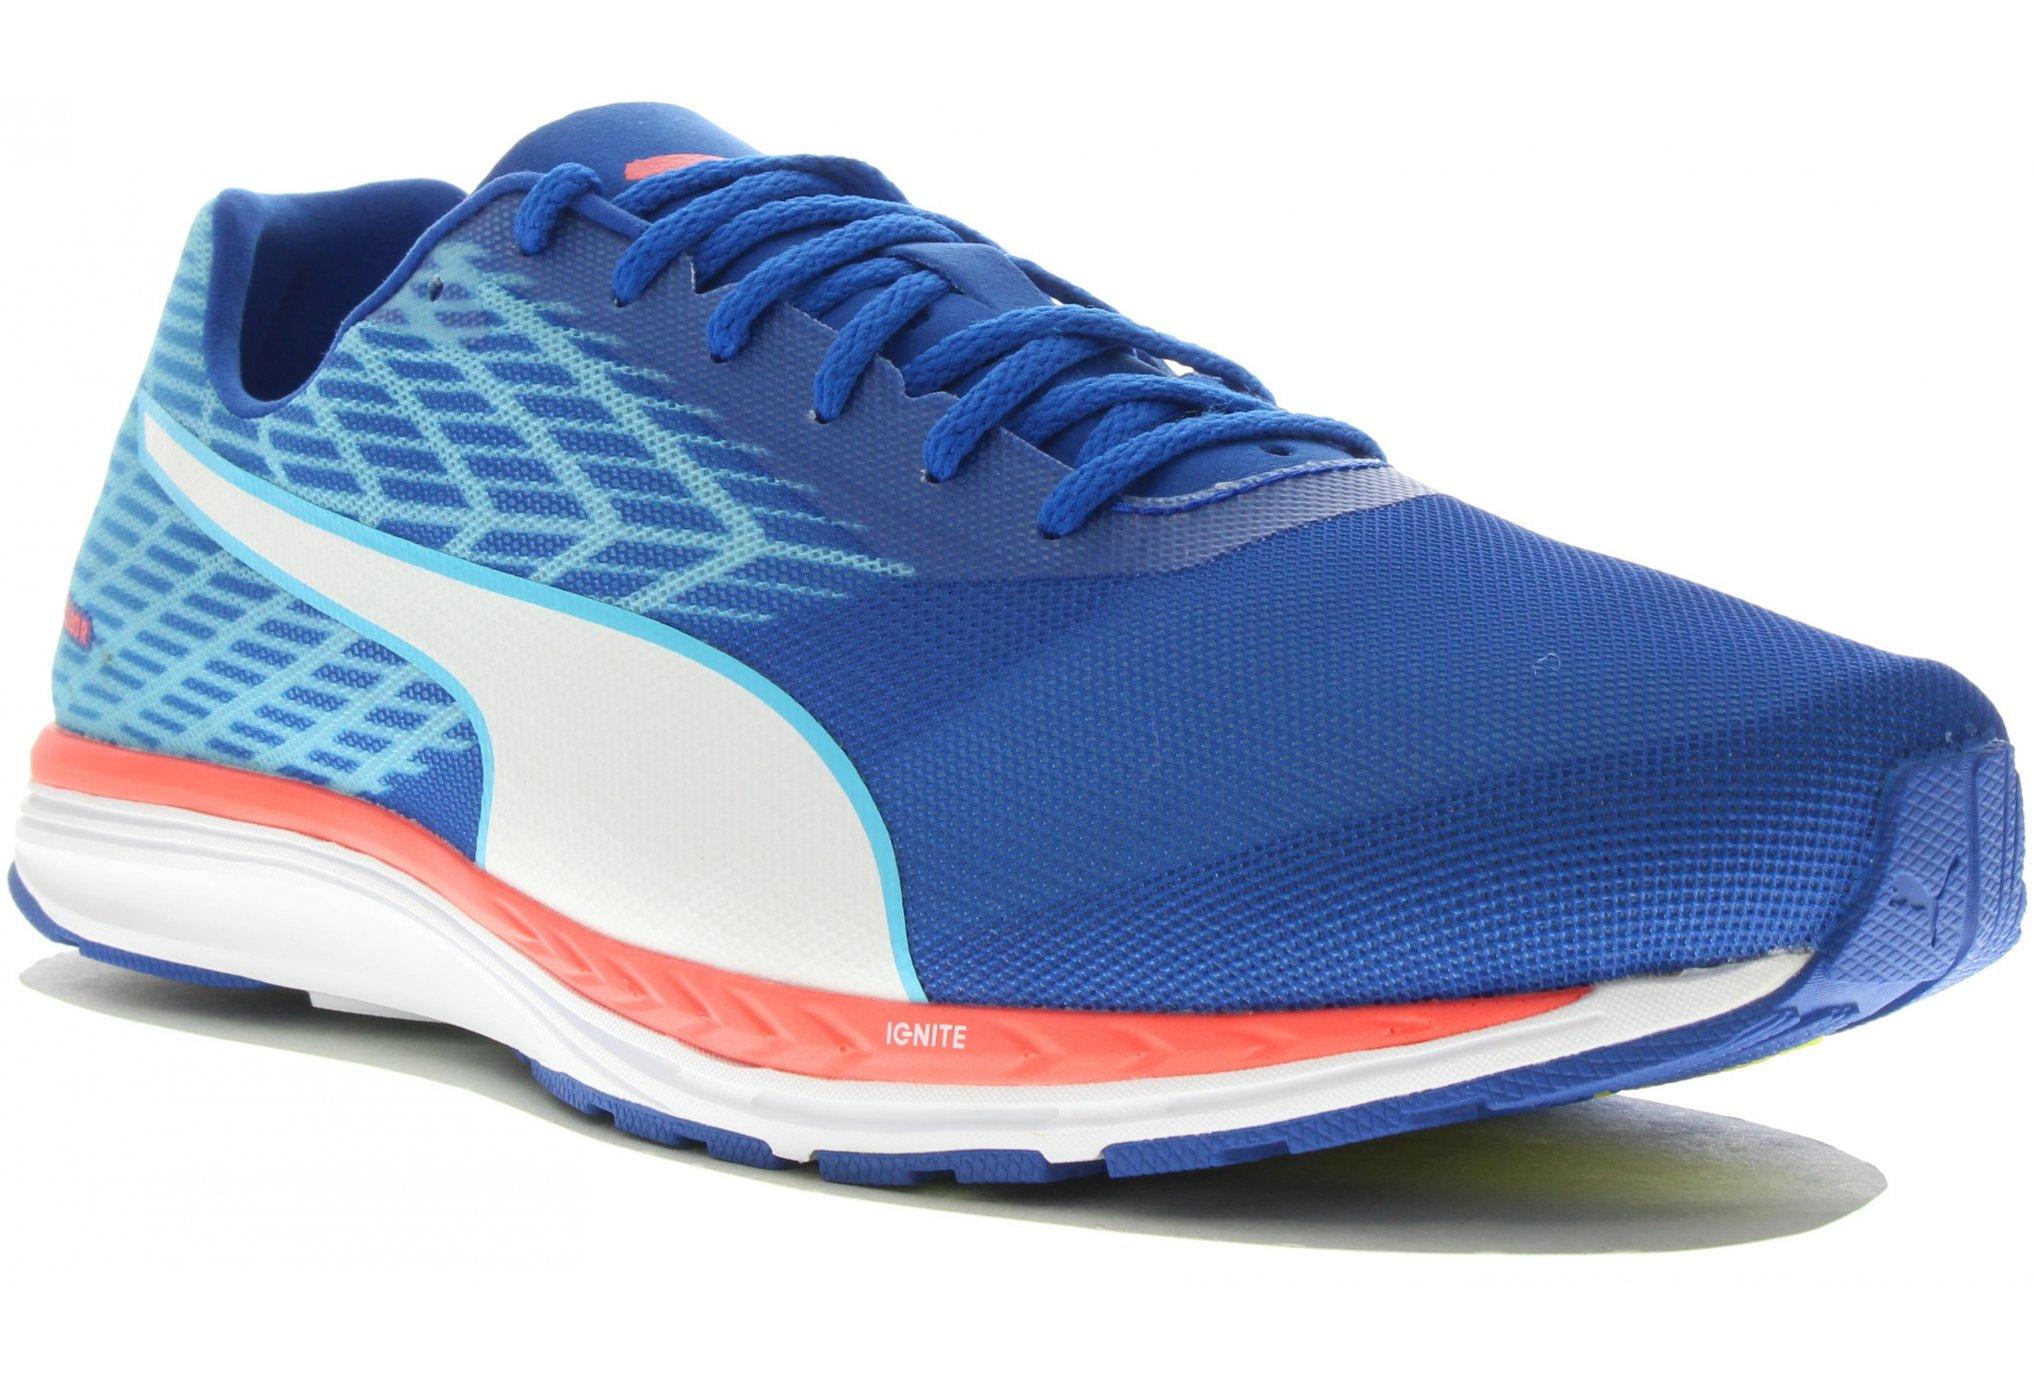 Puma Speed 100 R Ignite M Chaussures homme